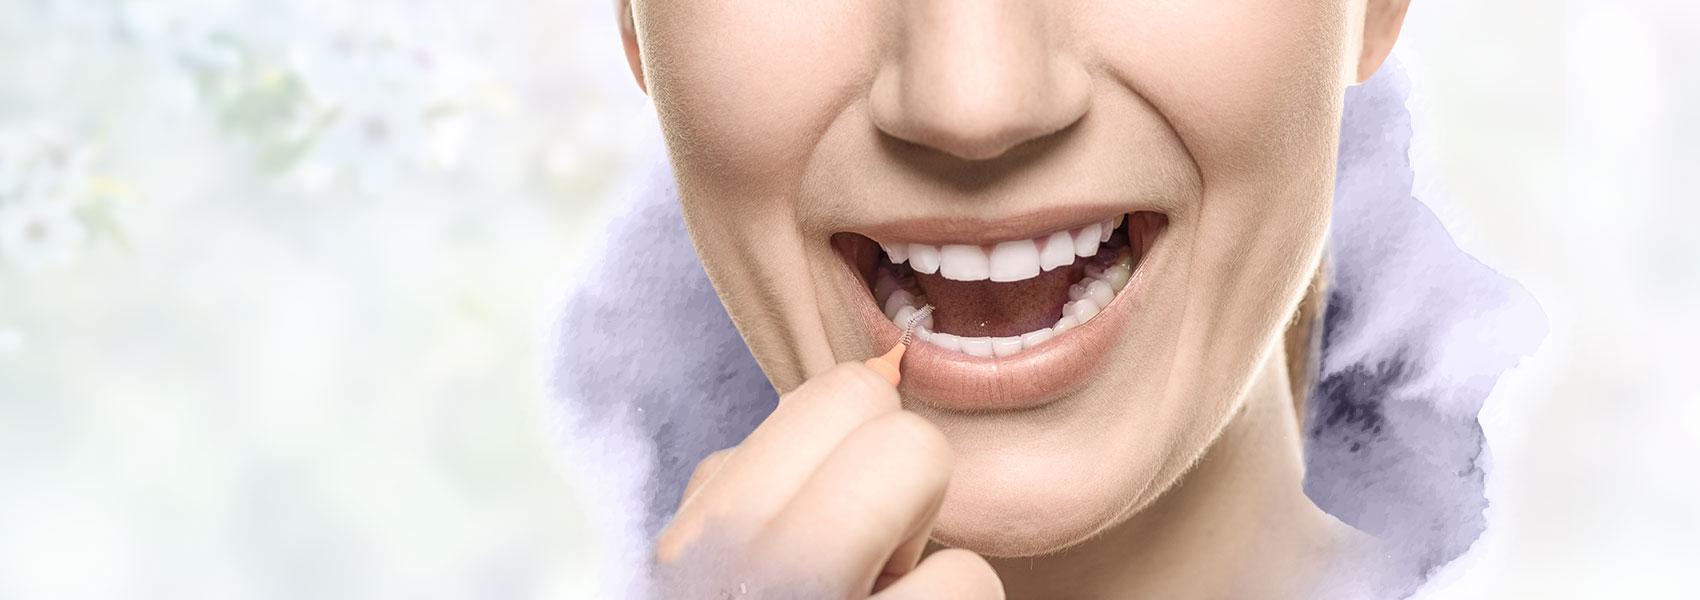 Kieferorthopäde Bargteheide - Mundhygiene